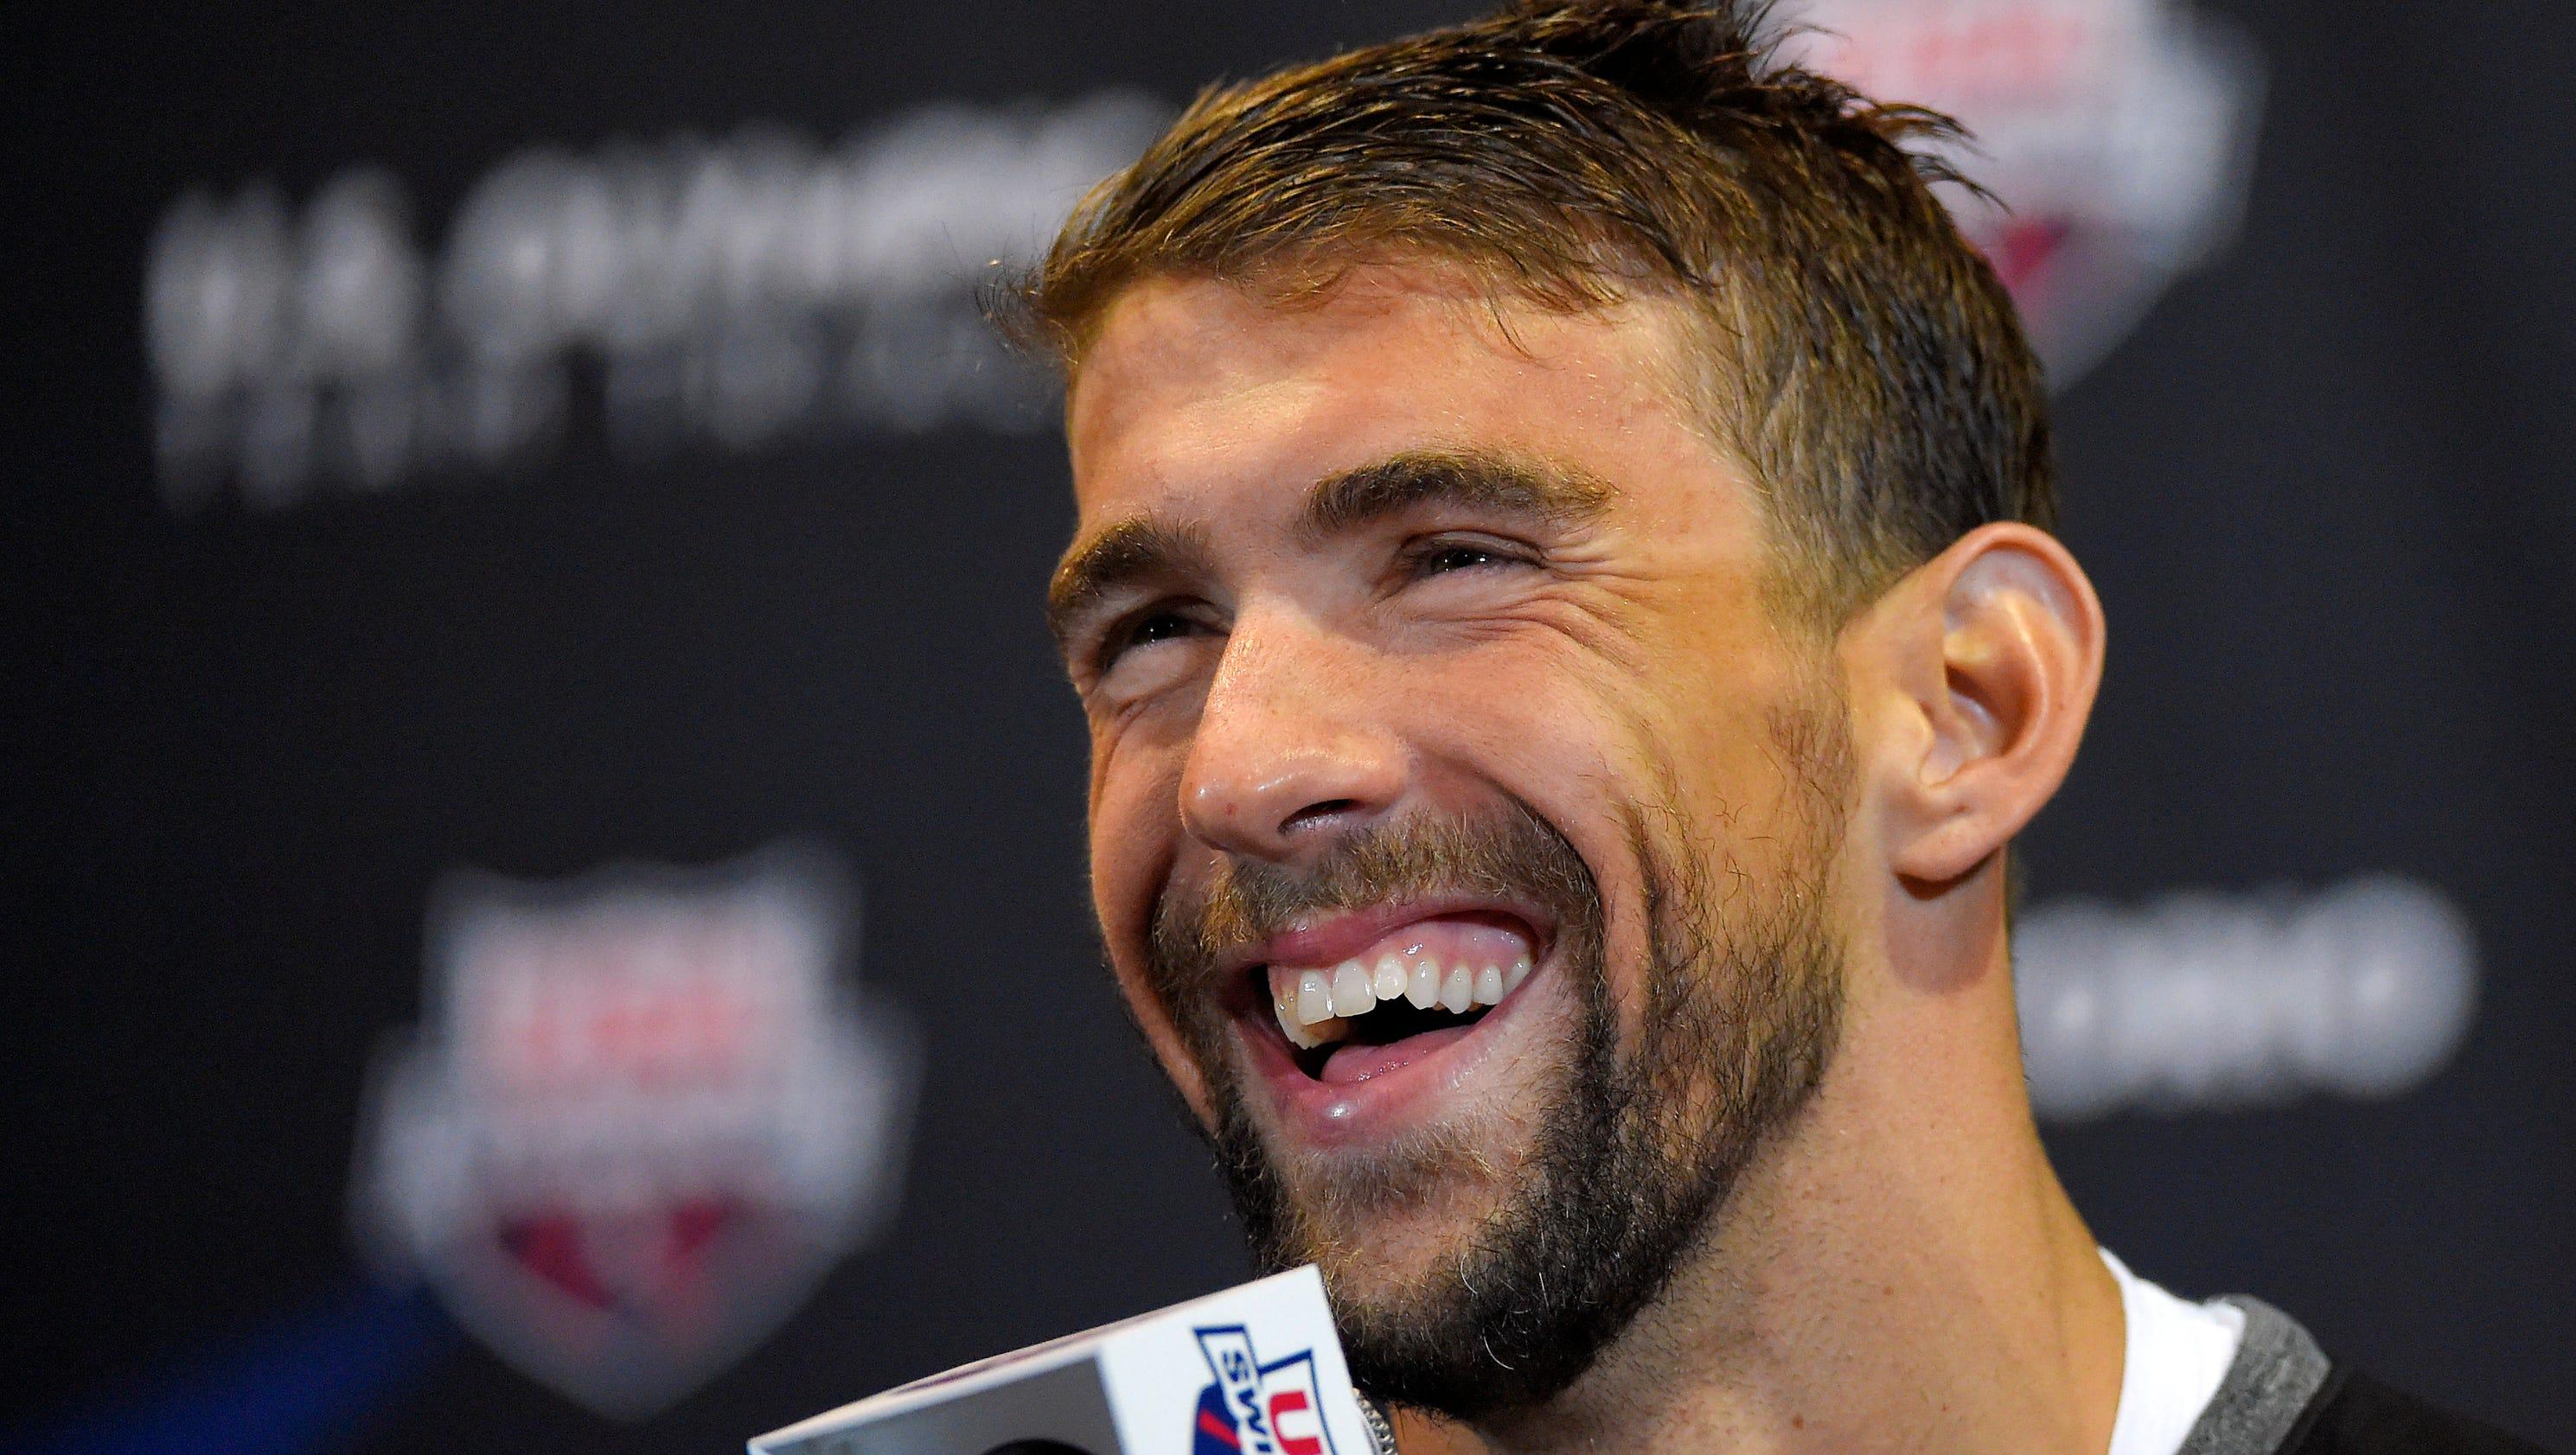 Olympic swimmer Michael Phelps enjoys fatherhood as Rio Summer Games near